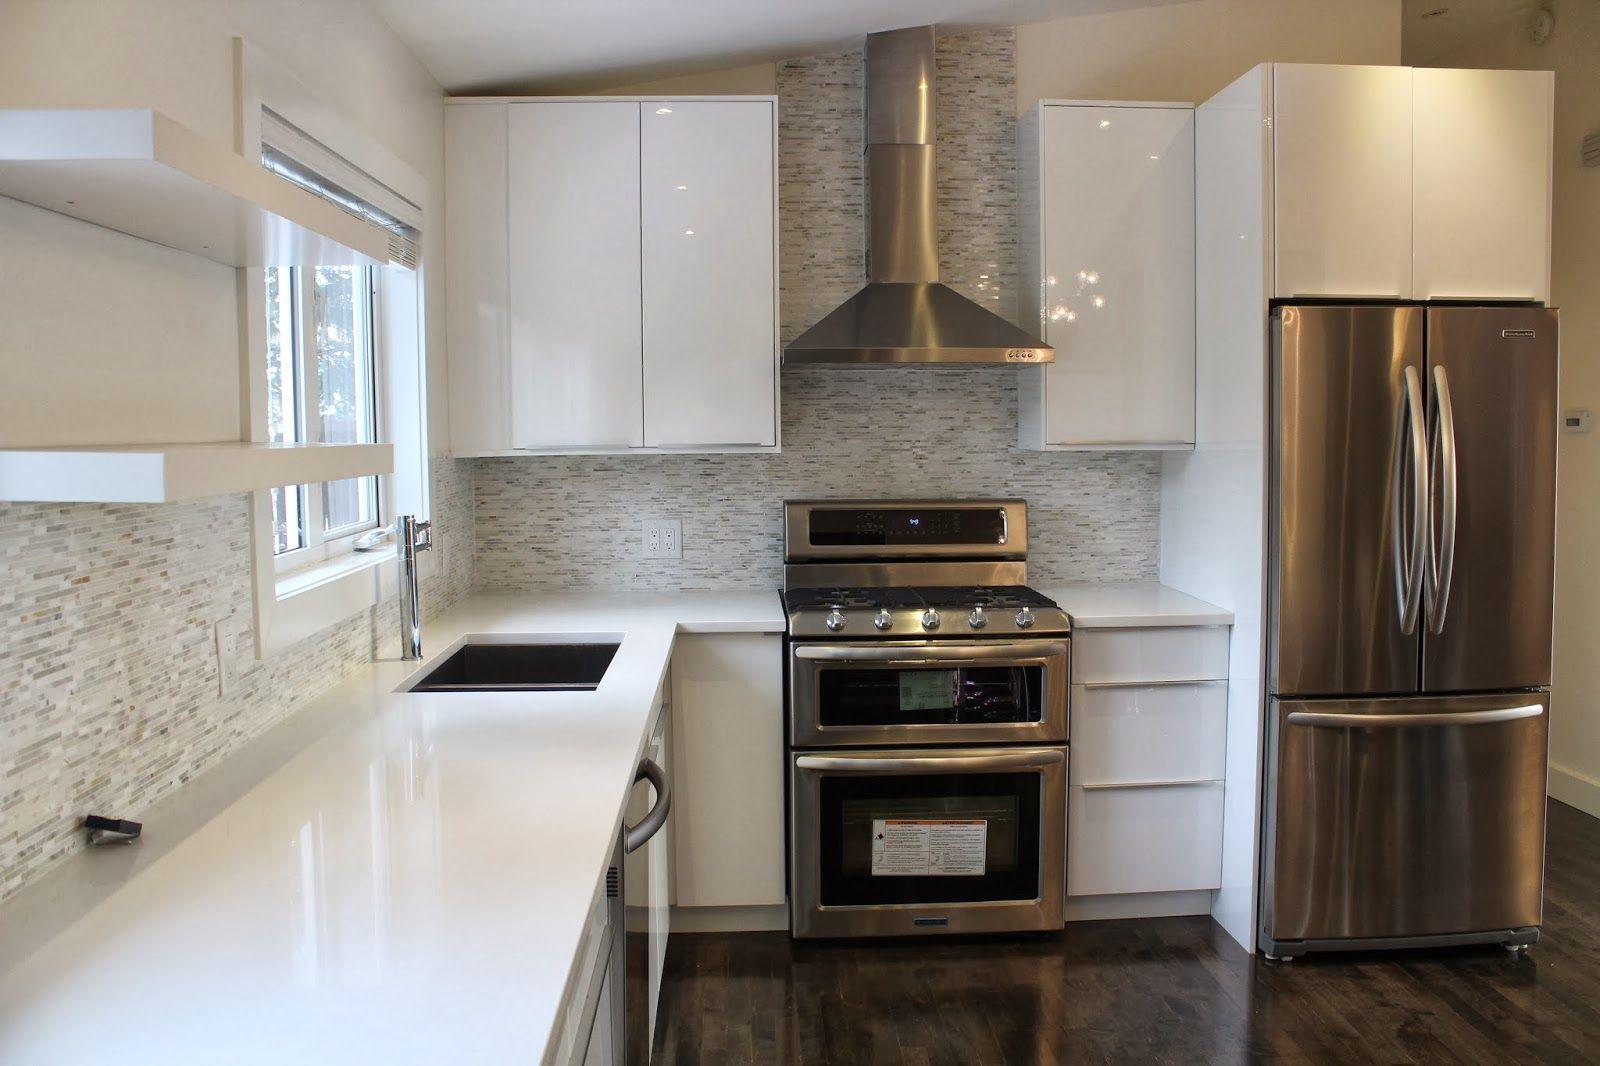 Modern Kitchen Cabinets Ikea ikea abstract white high gloss kitchen. benjamin moore cloud white